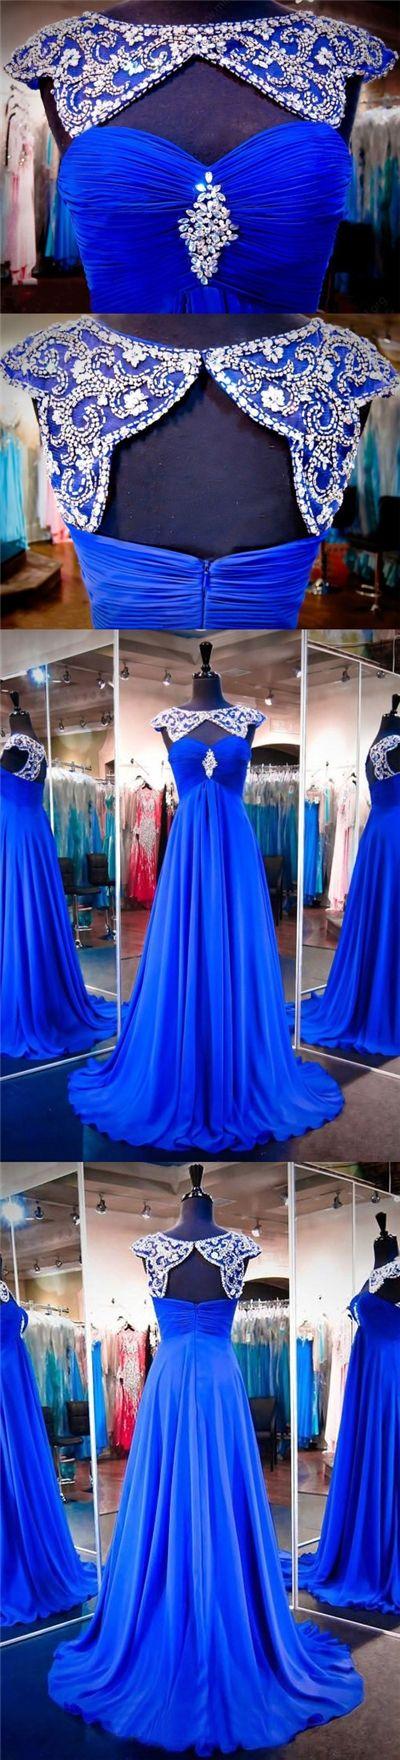 Chic Prom Dresses Bateau Sweep/Brush Train Chiffon Royal Blue Prom Dress/Evening Dress JKL291#royalblue #royalbluedress #longdress #longpromdress #promdresses #sequins #rhinestone #sweetheart #fashion #style #dance #dancewear